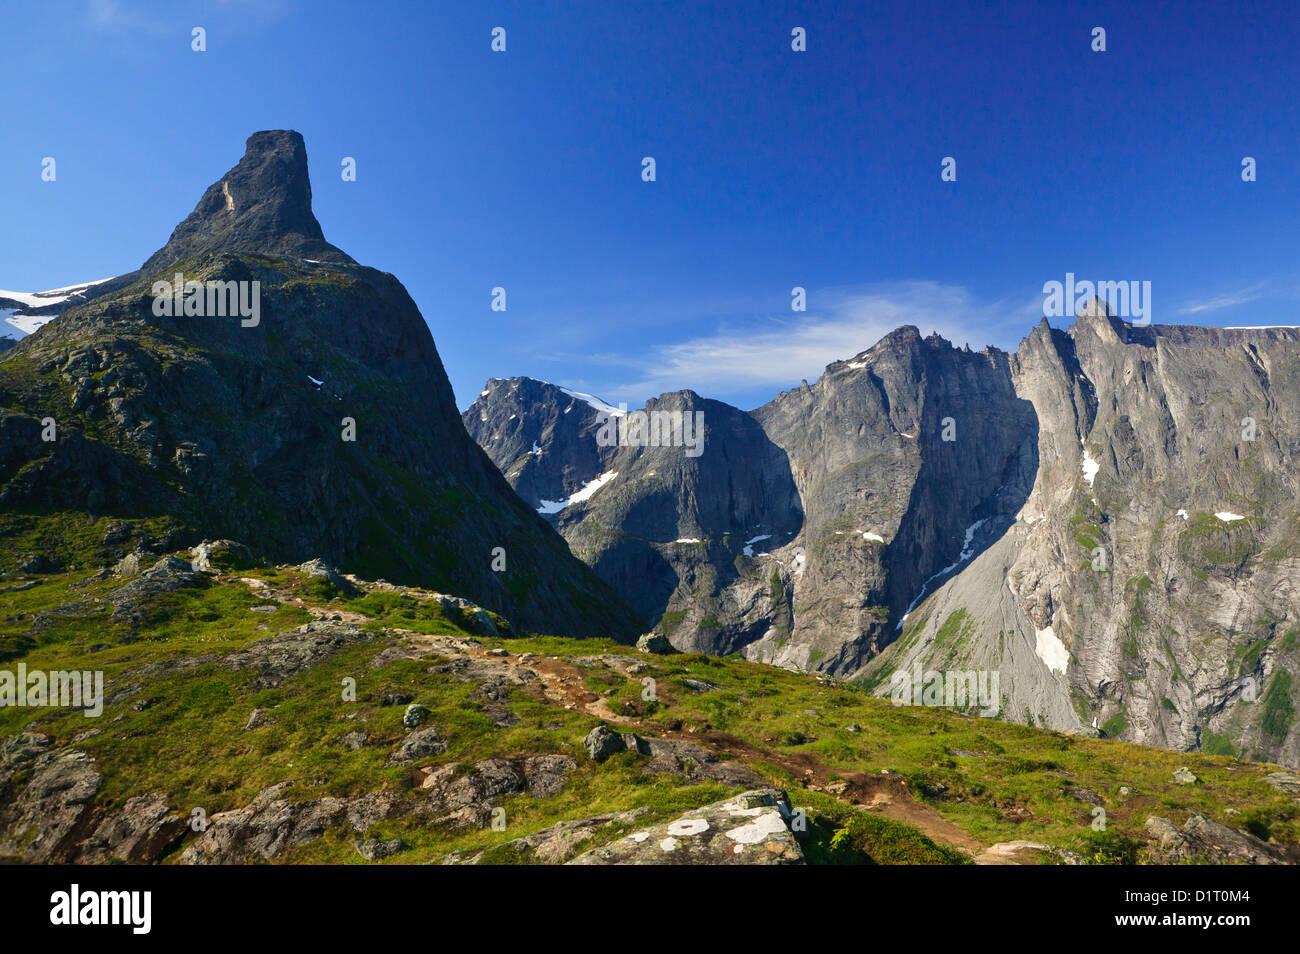 The peak Romsdalshorn (left) and the Troll Wall and Trolltindane (background) in Romsdalen valley, Møre og - Stock Image